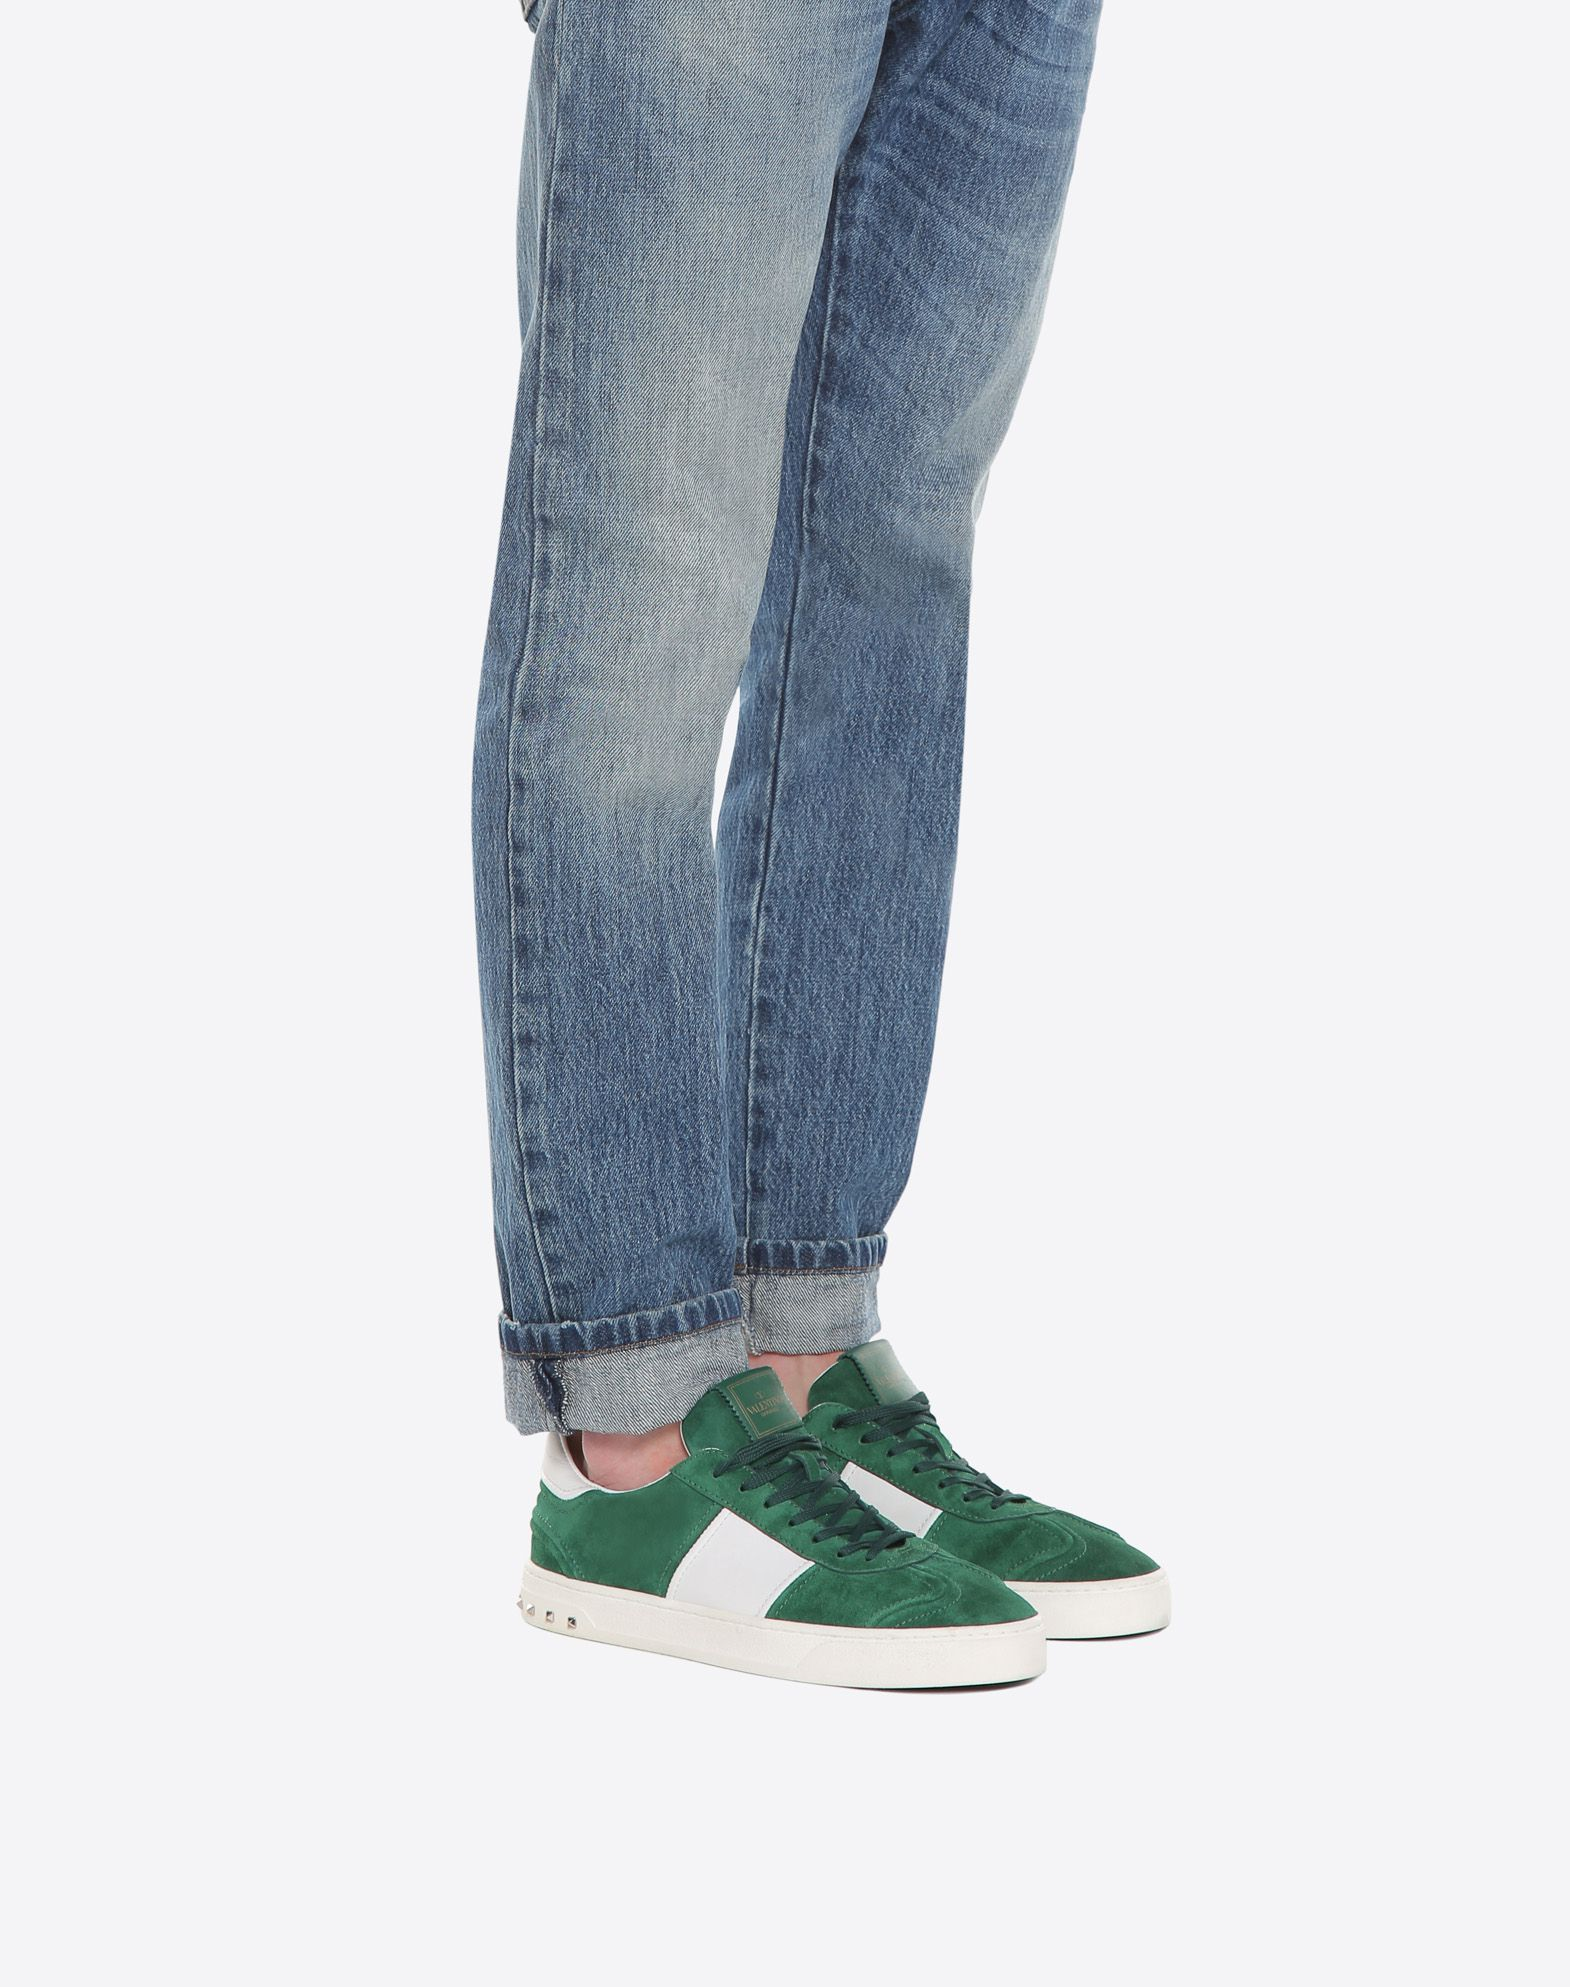 VALENTINO GARAVANI UOMO Flycrew Sneaker Sneaker U a